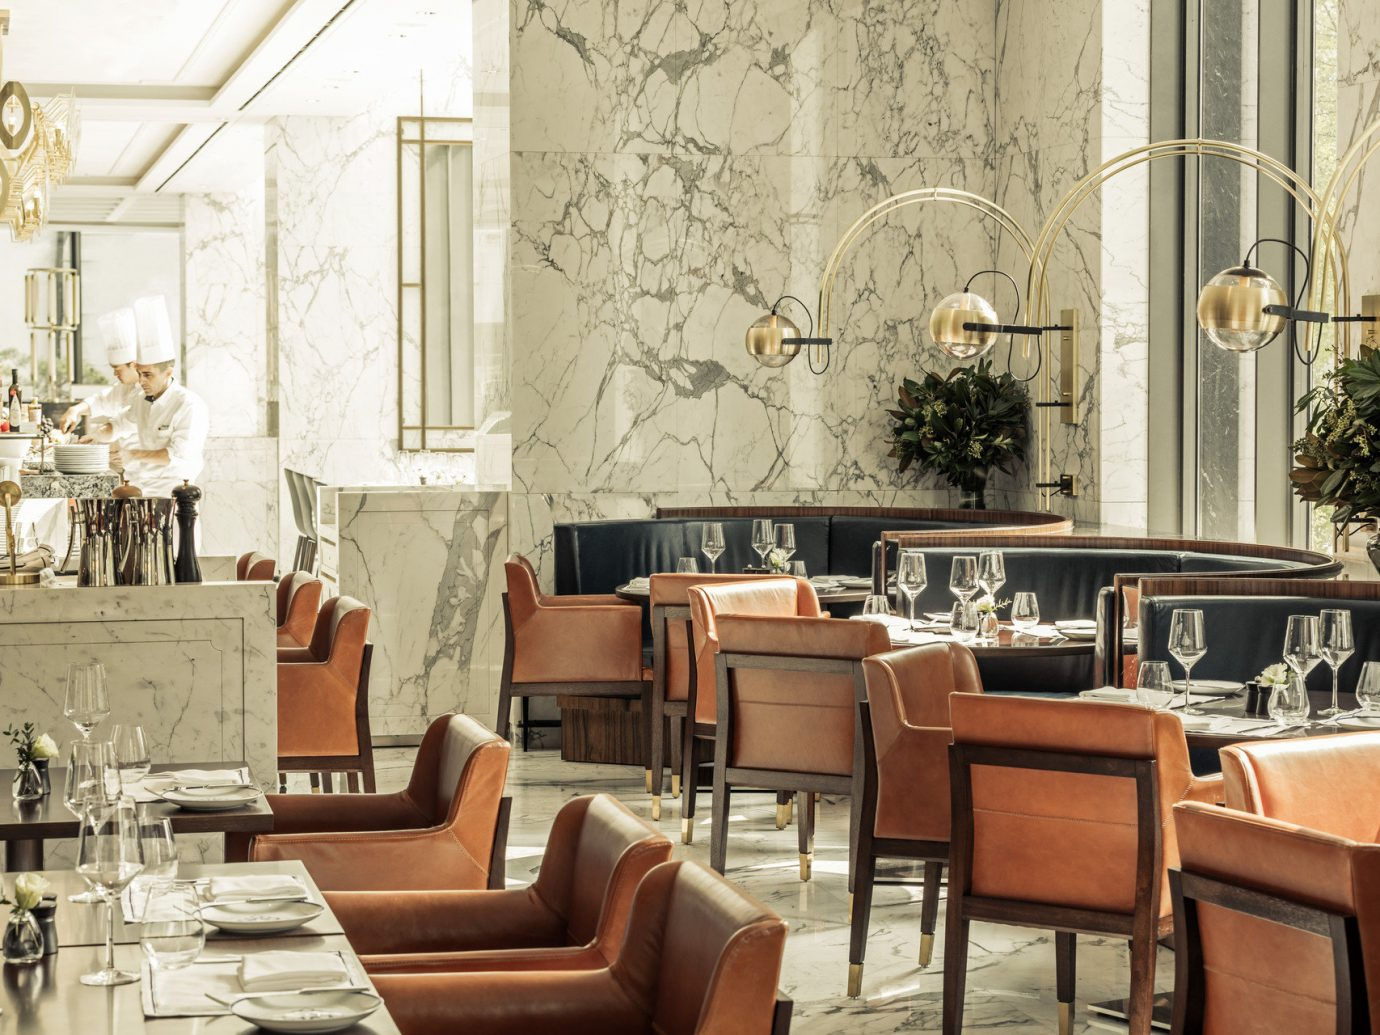 Trip Ideas table indoor room dining room restaurant interior design meal estate living room furniture decorated